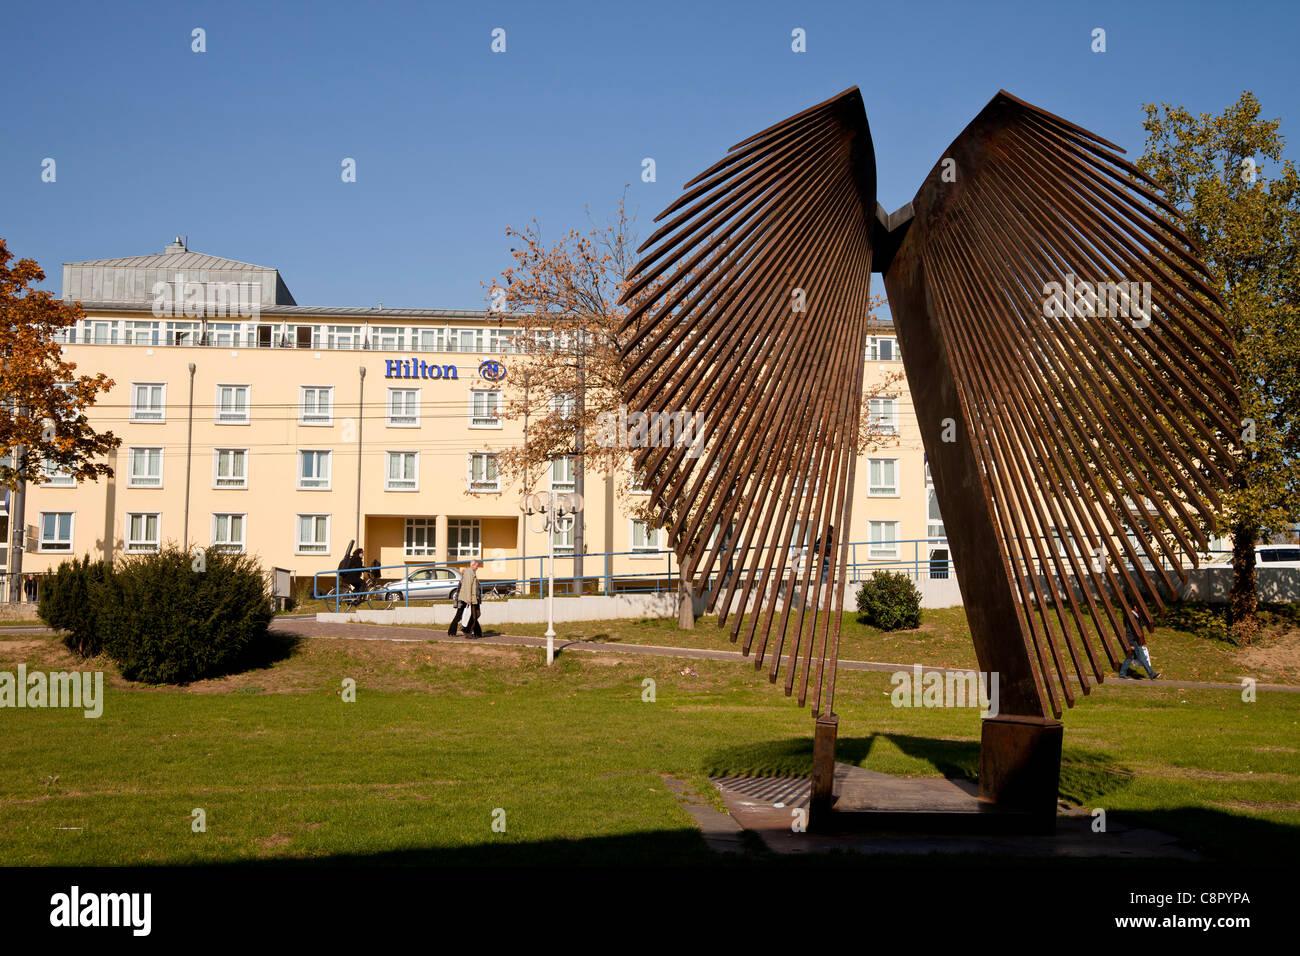 Hotel Hilton in Bonn, North Rhine-Westphalia, Germany, - Stock Image